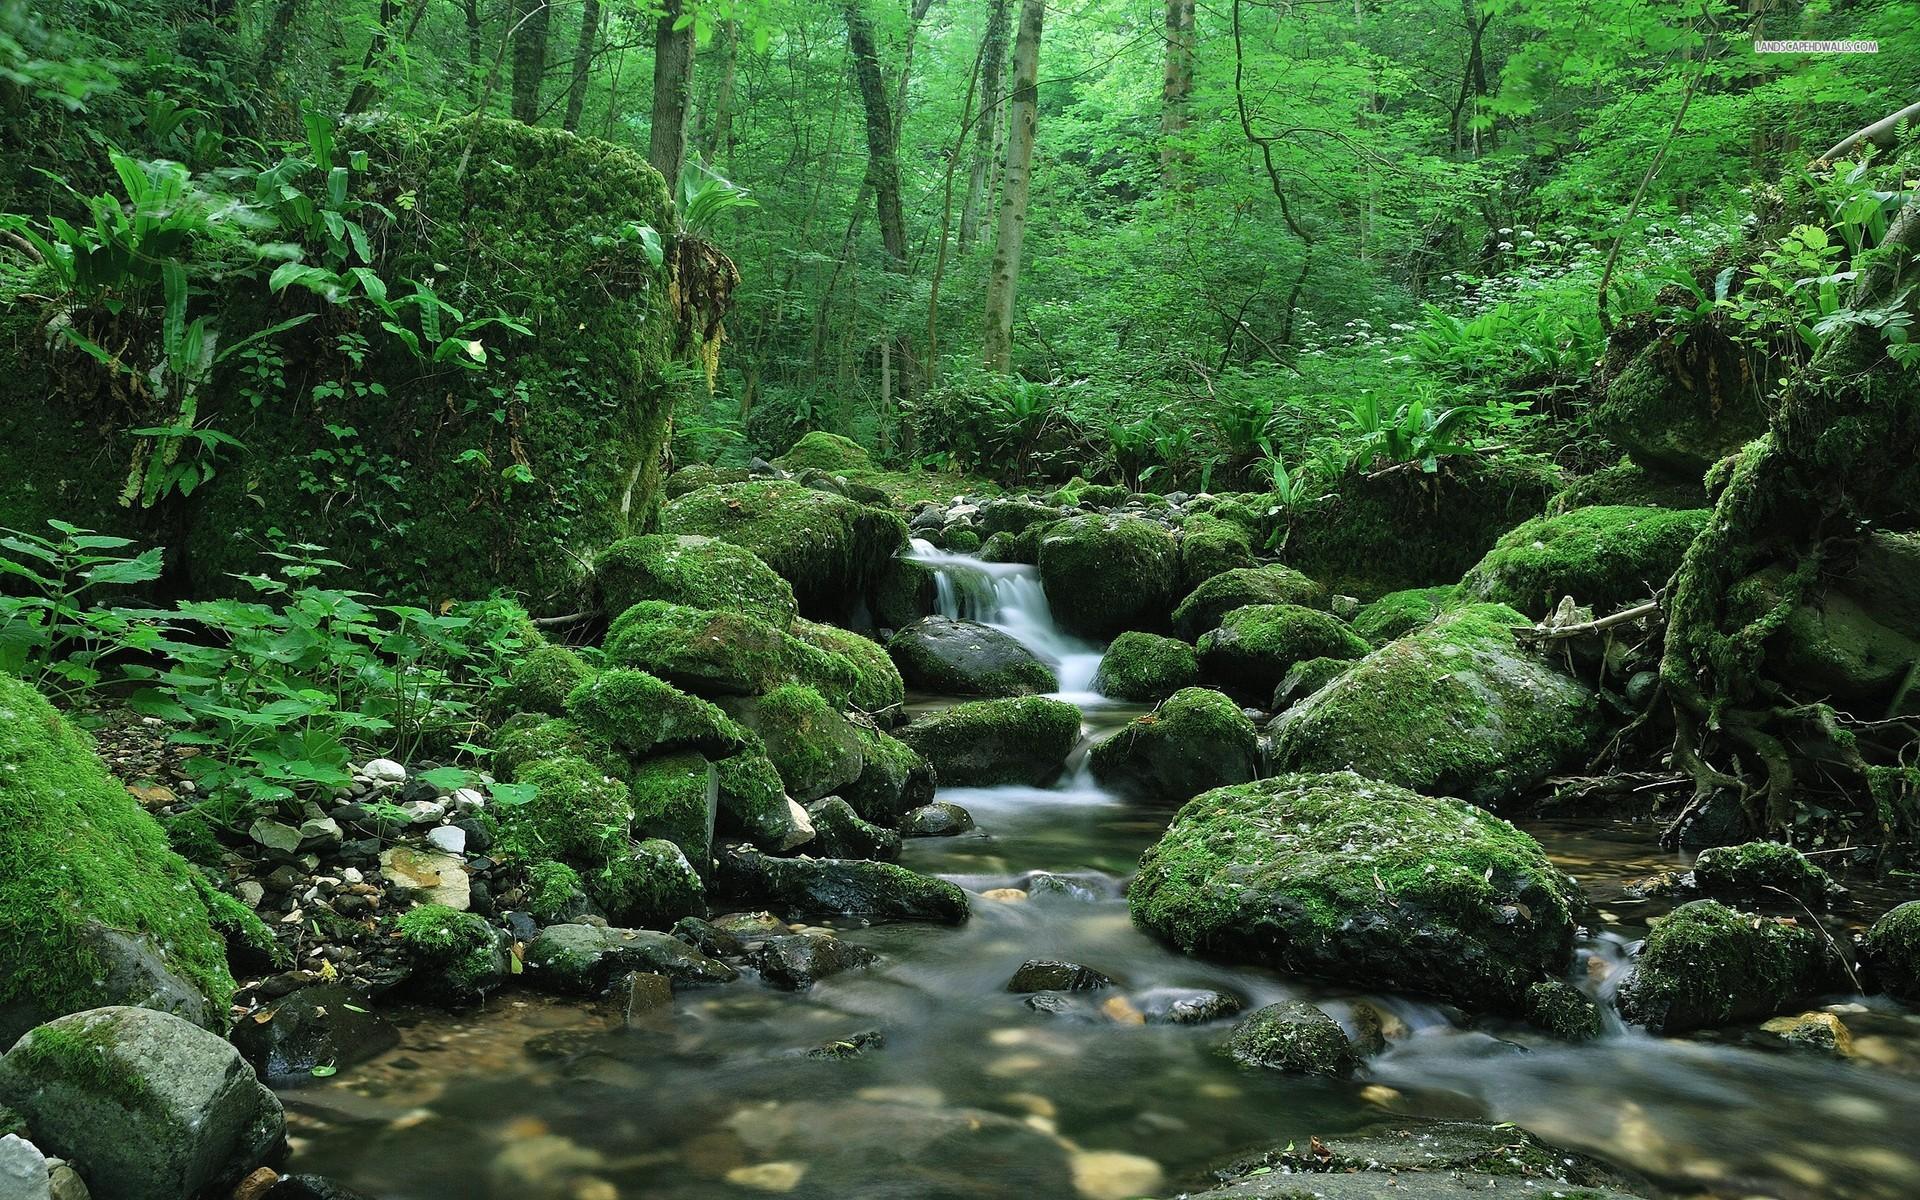 ... Forest Stream wallpaper 1920x1080 1080p ...